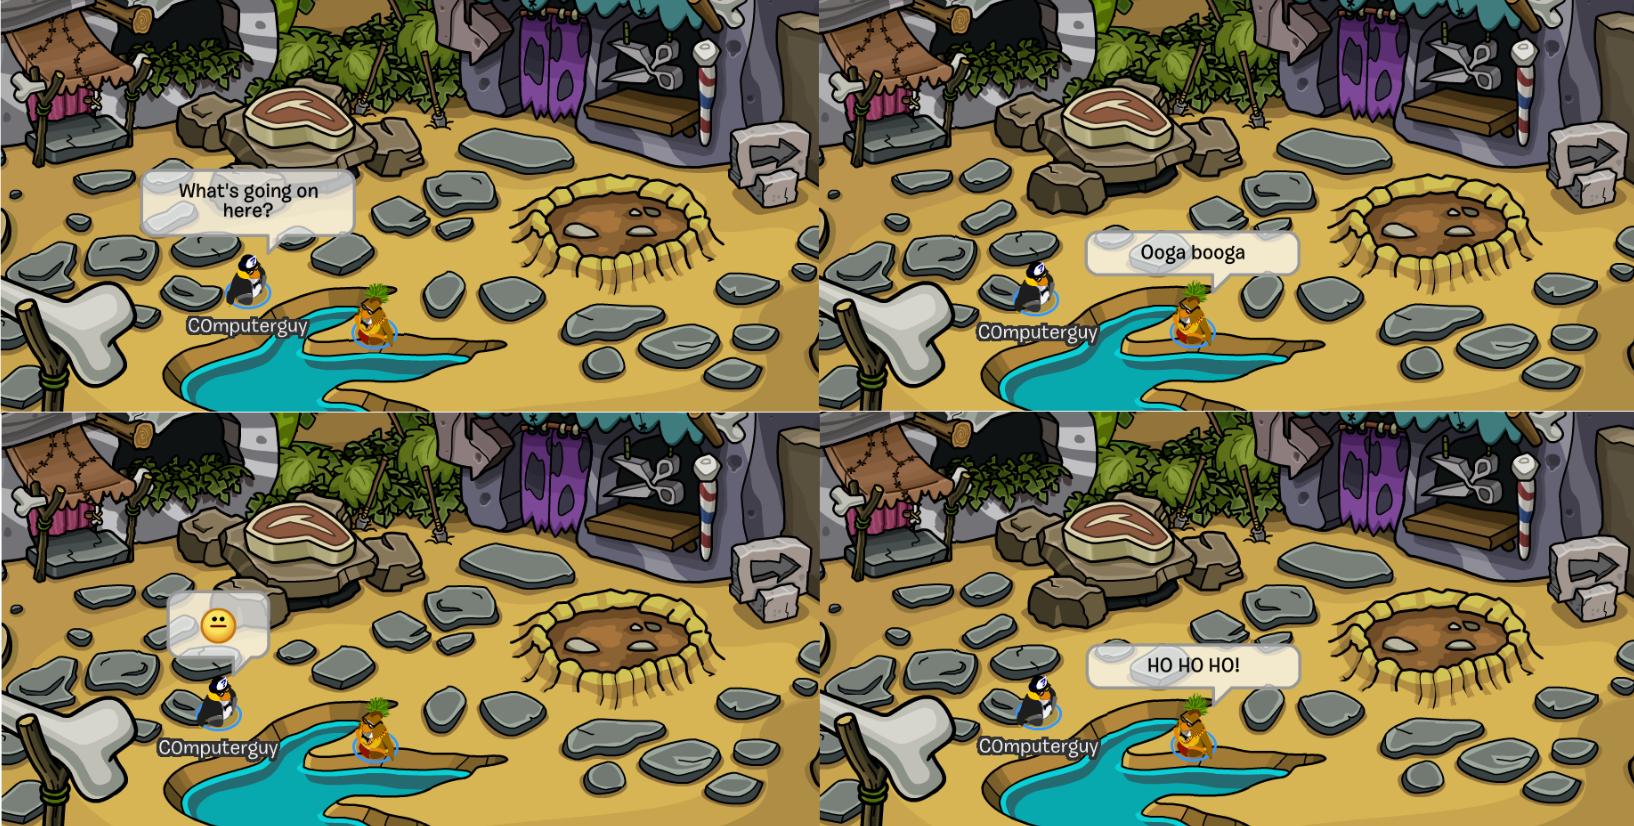 Club Penguin Memes: Ooga Booga! – Episode 7